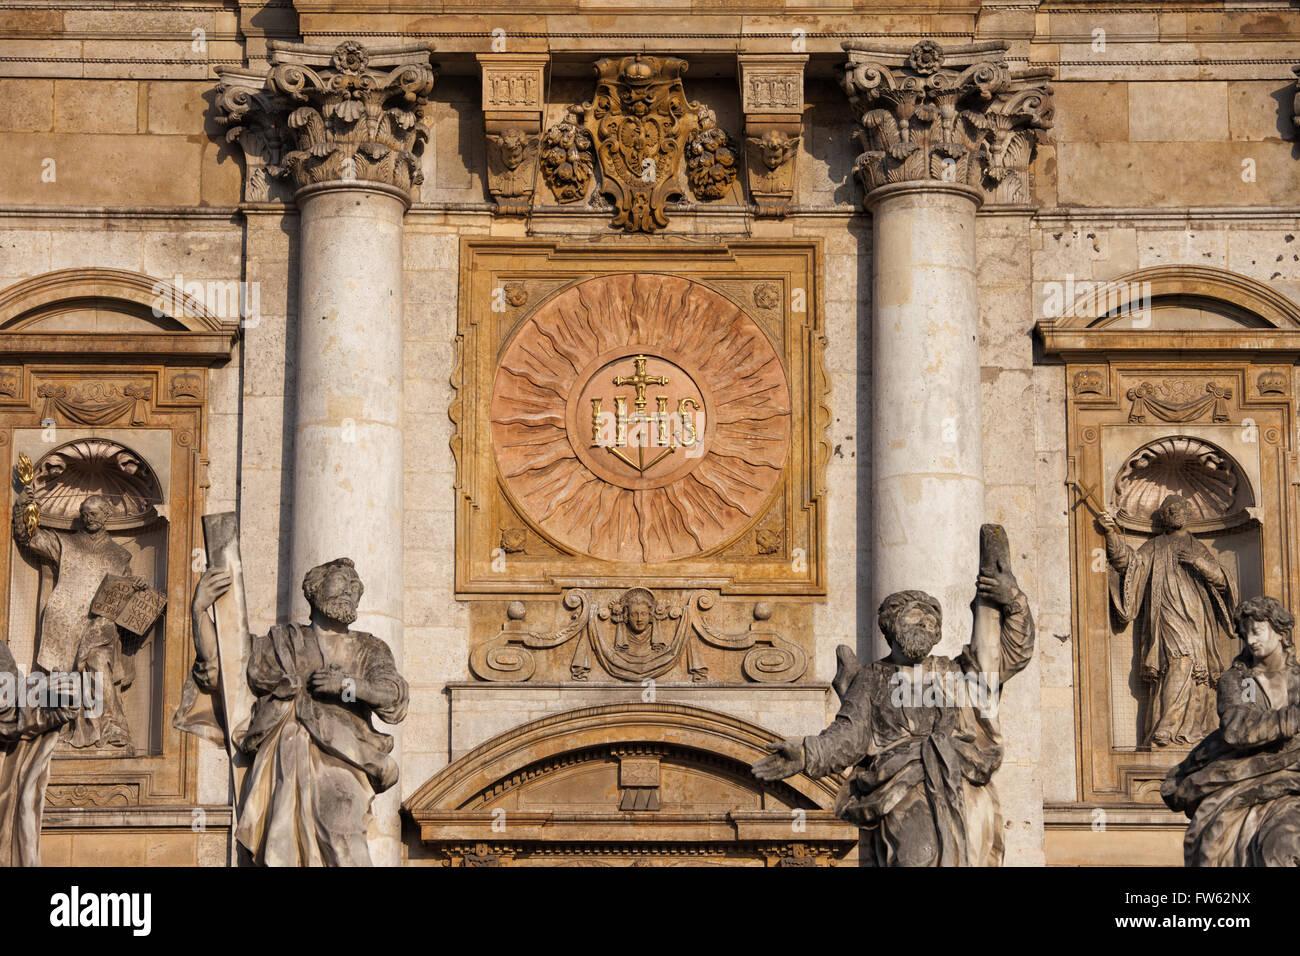 Polen, Stadt Krakow (Krakau), Altstadt, Kirche St. Peter und Paul, All Saints Parish, Sonne Relief, architektonische Stockbild